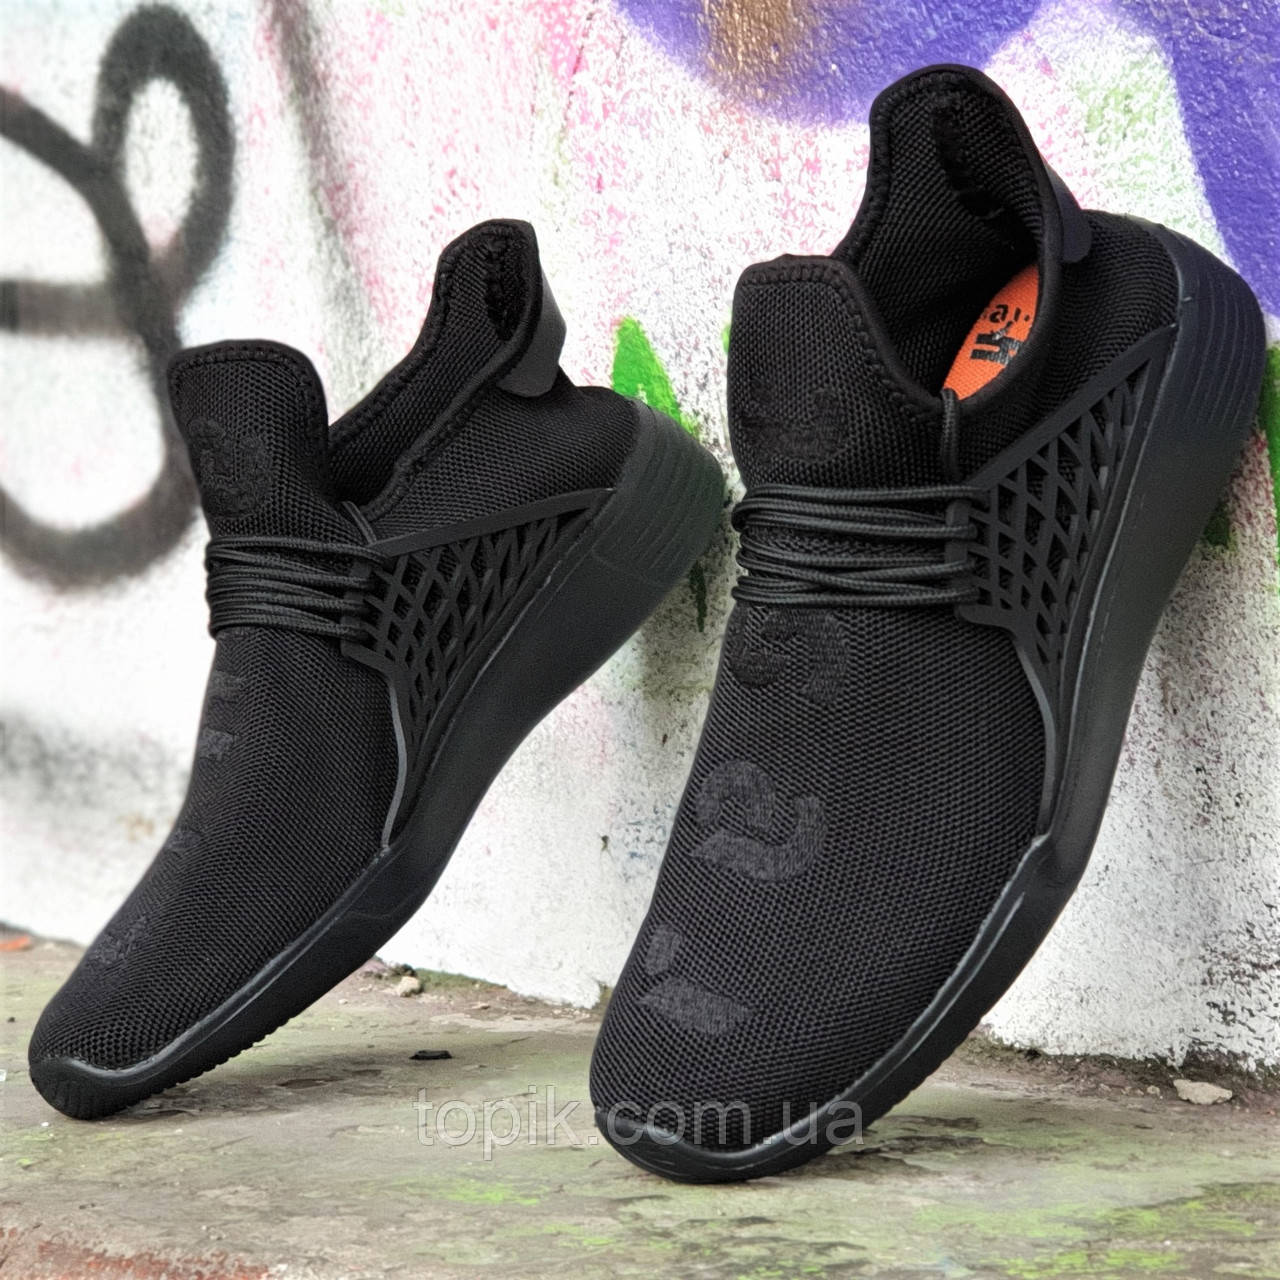 Мужские кроссовки летние  (Код: 1383а)